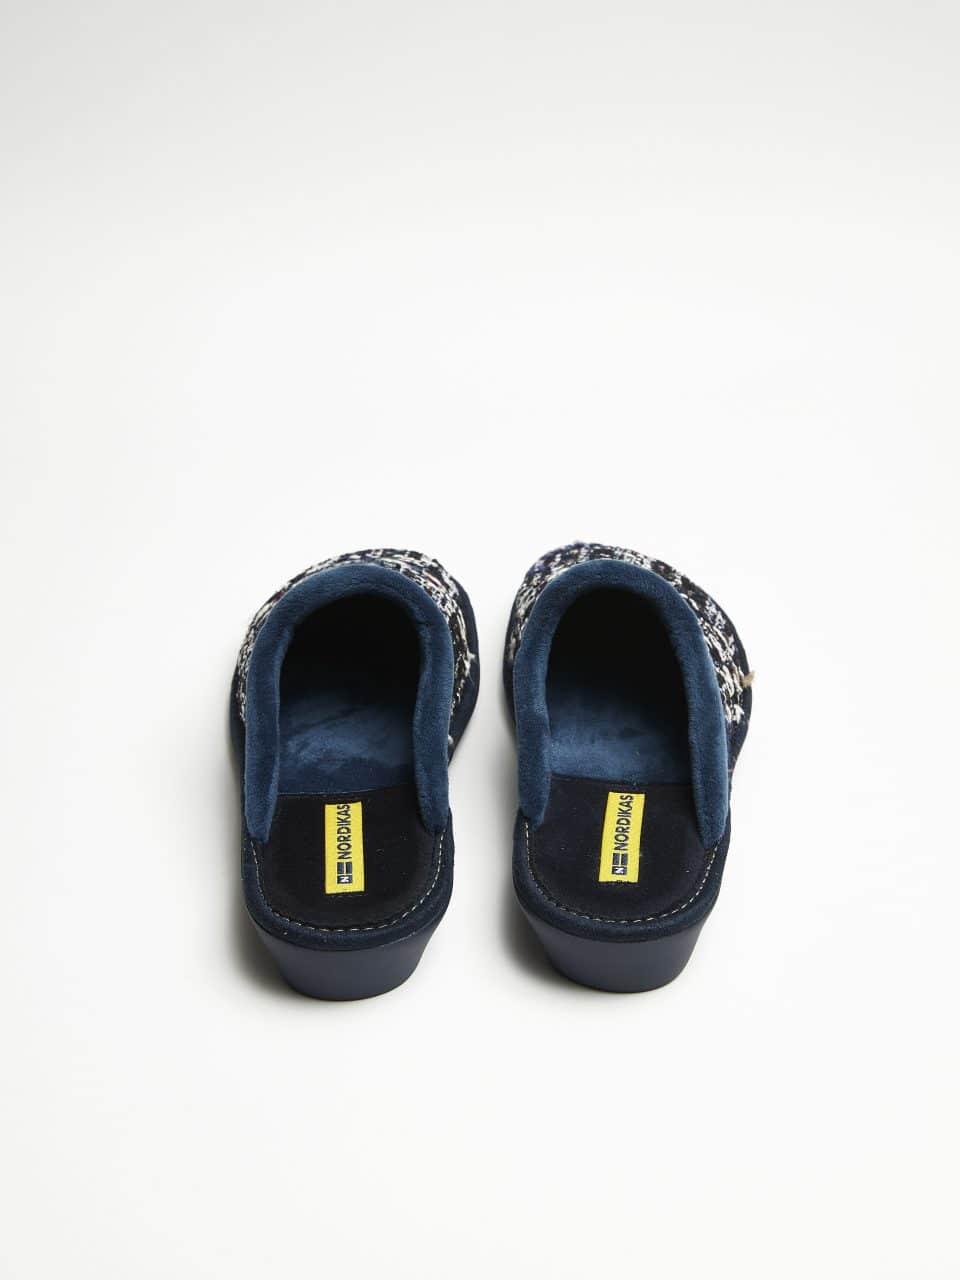 ZUECO TRICOT MARINO Marcas en Loyna Shoes